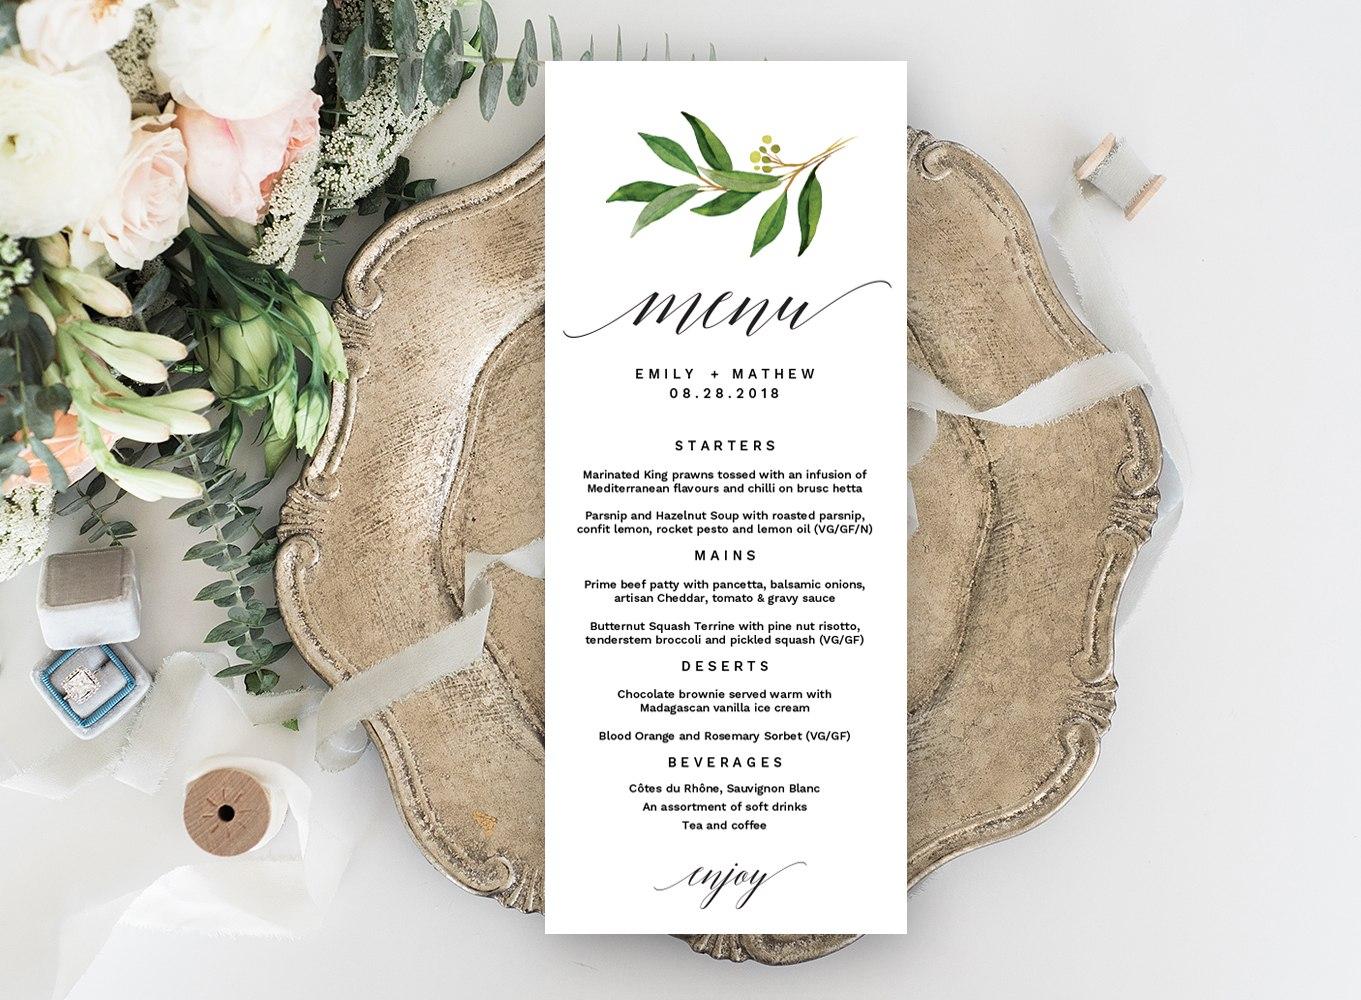 Wedding Menu Editable Template  Pixelify  Best Free Fonts Mockups With Regard To Editable Menu Templates Free